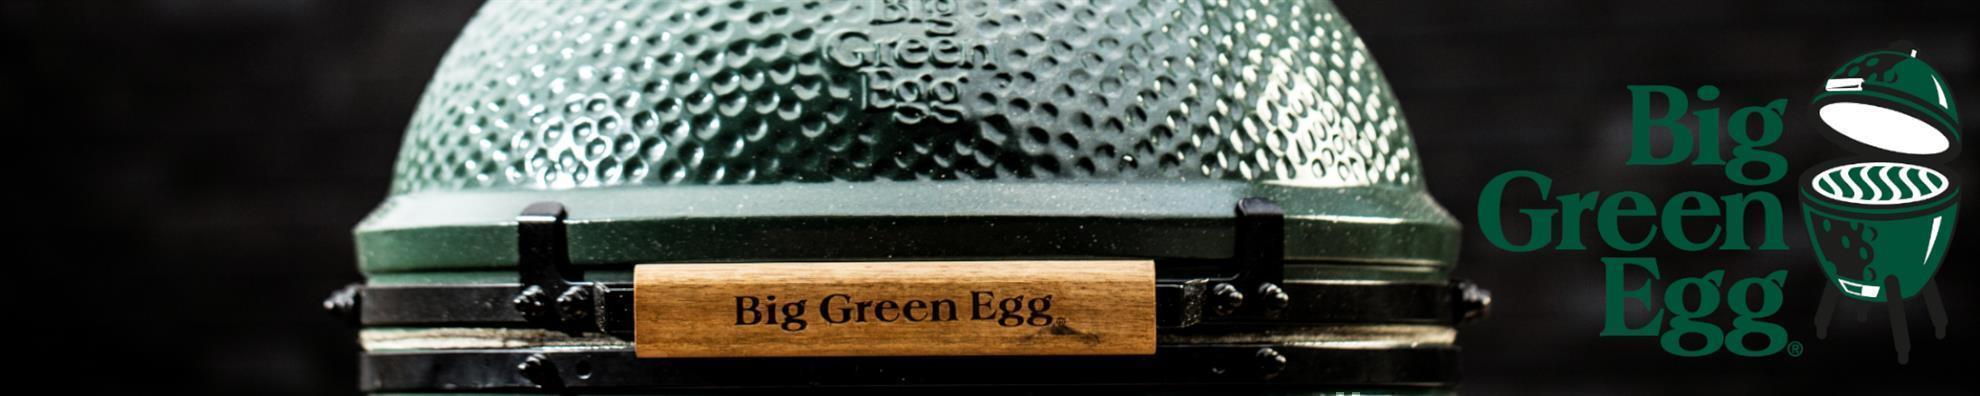 Big Green Egg - 5-teiliges EGGspander-Set für XL